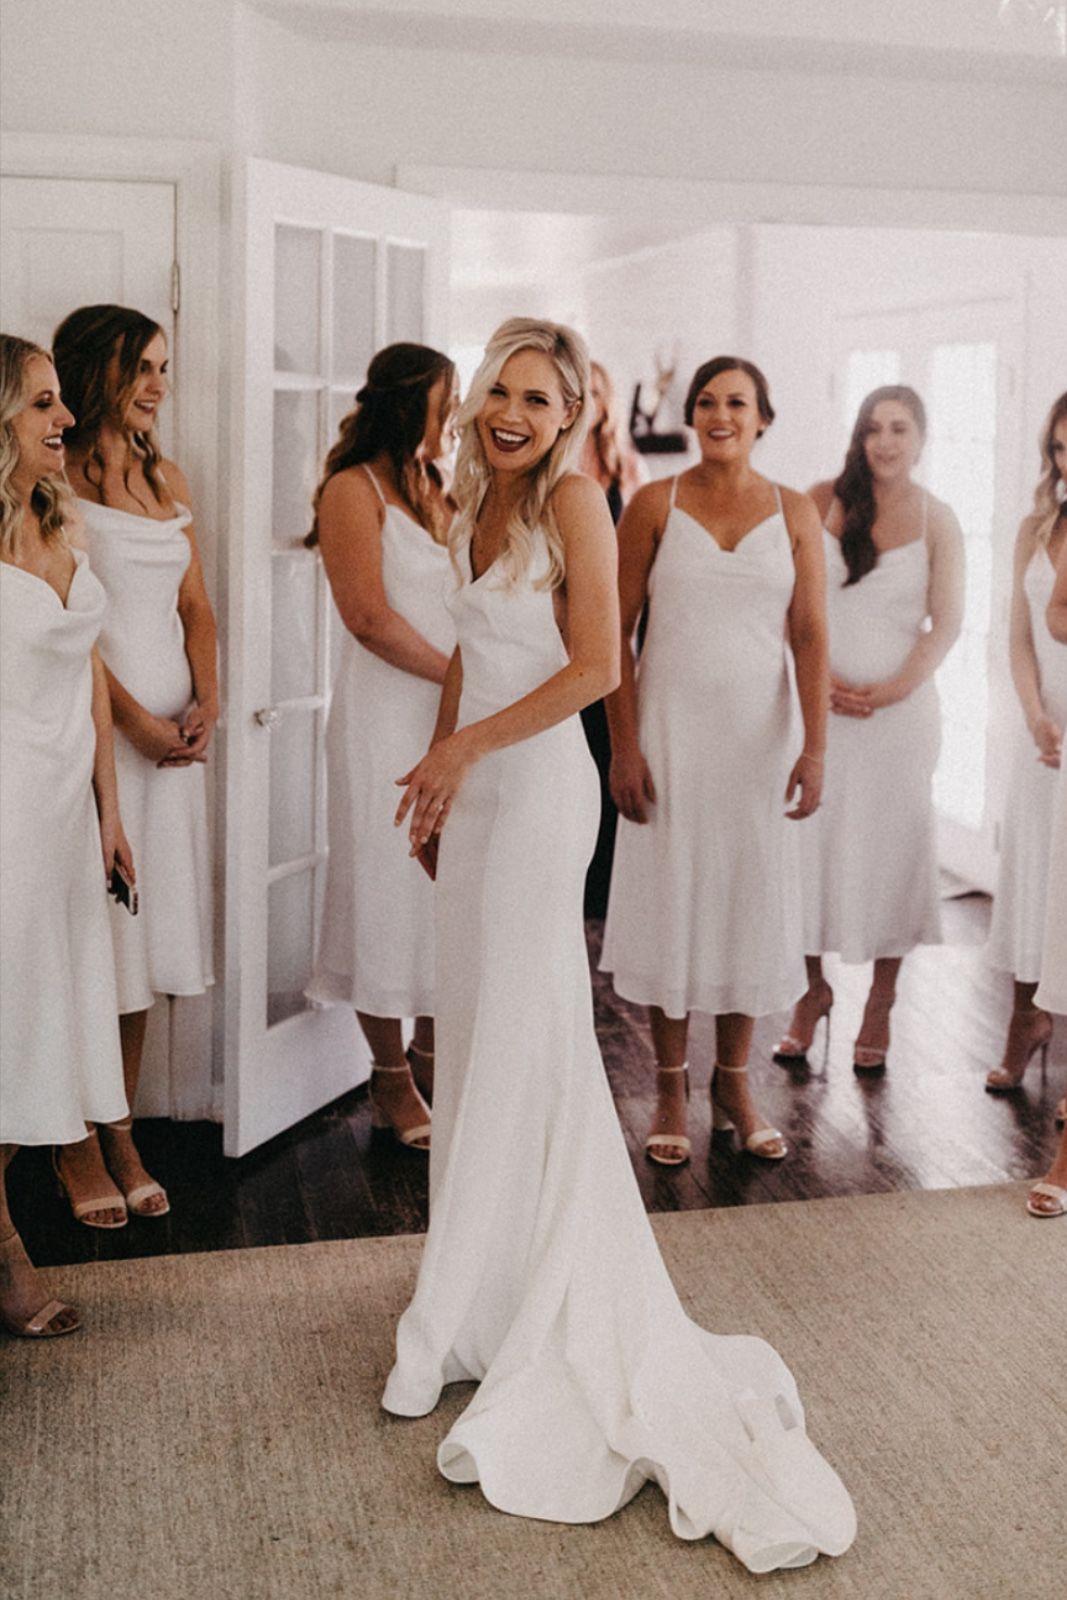 White Bridesmaid Dresses Austin, TX Elegant Barn Wedding